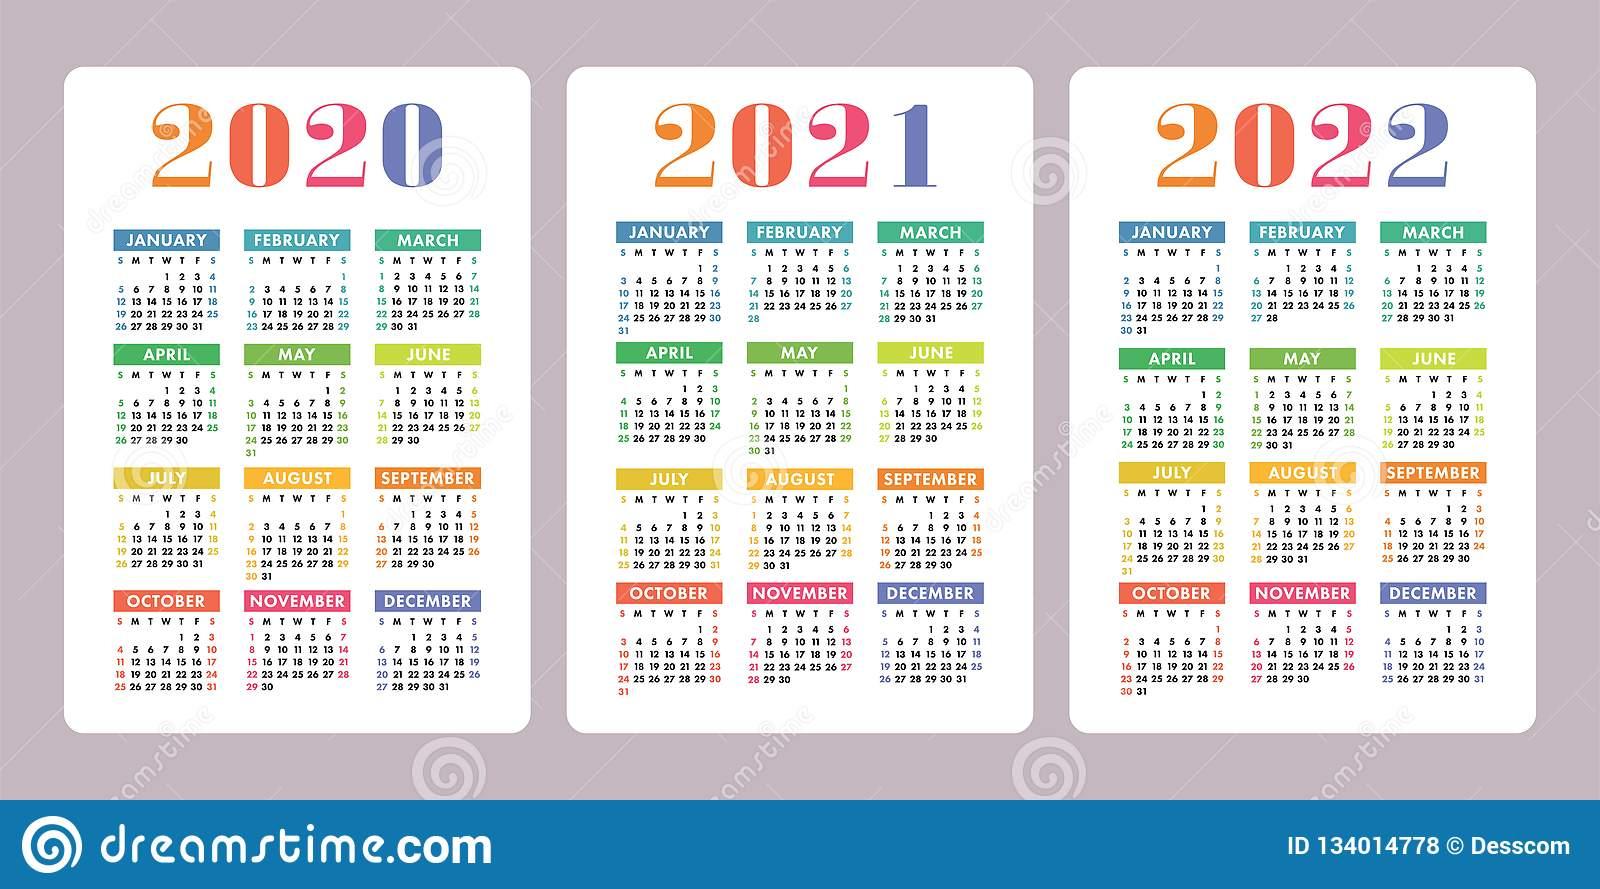 Calendar 2020, 2021, 2022 Years. Vertical Vector Calender pertaining to Free Printable Calendar 2020-2022